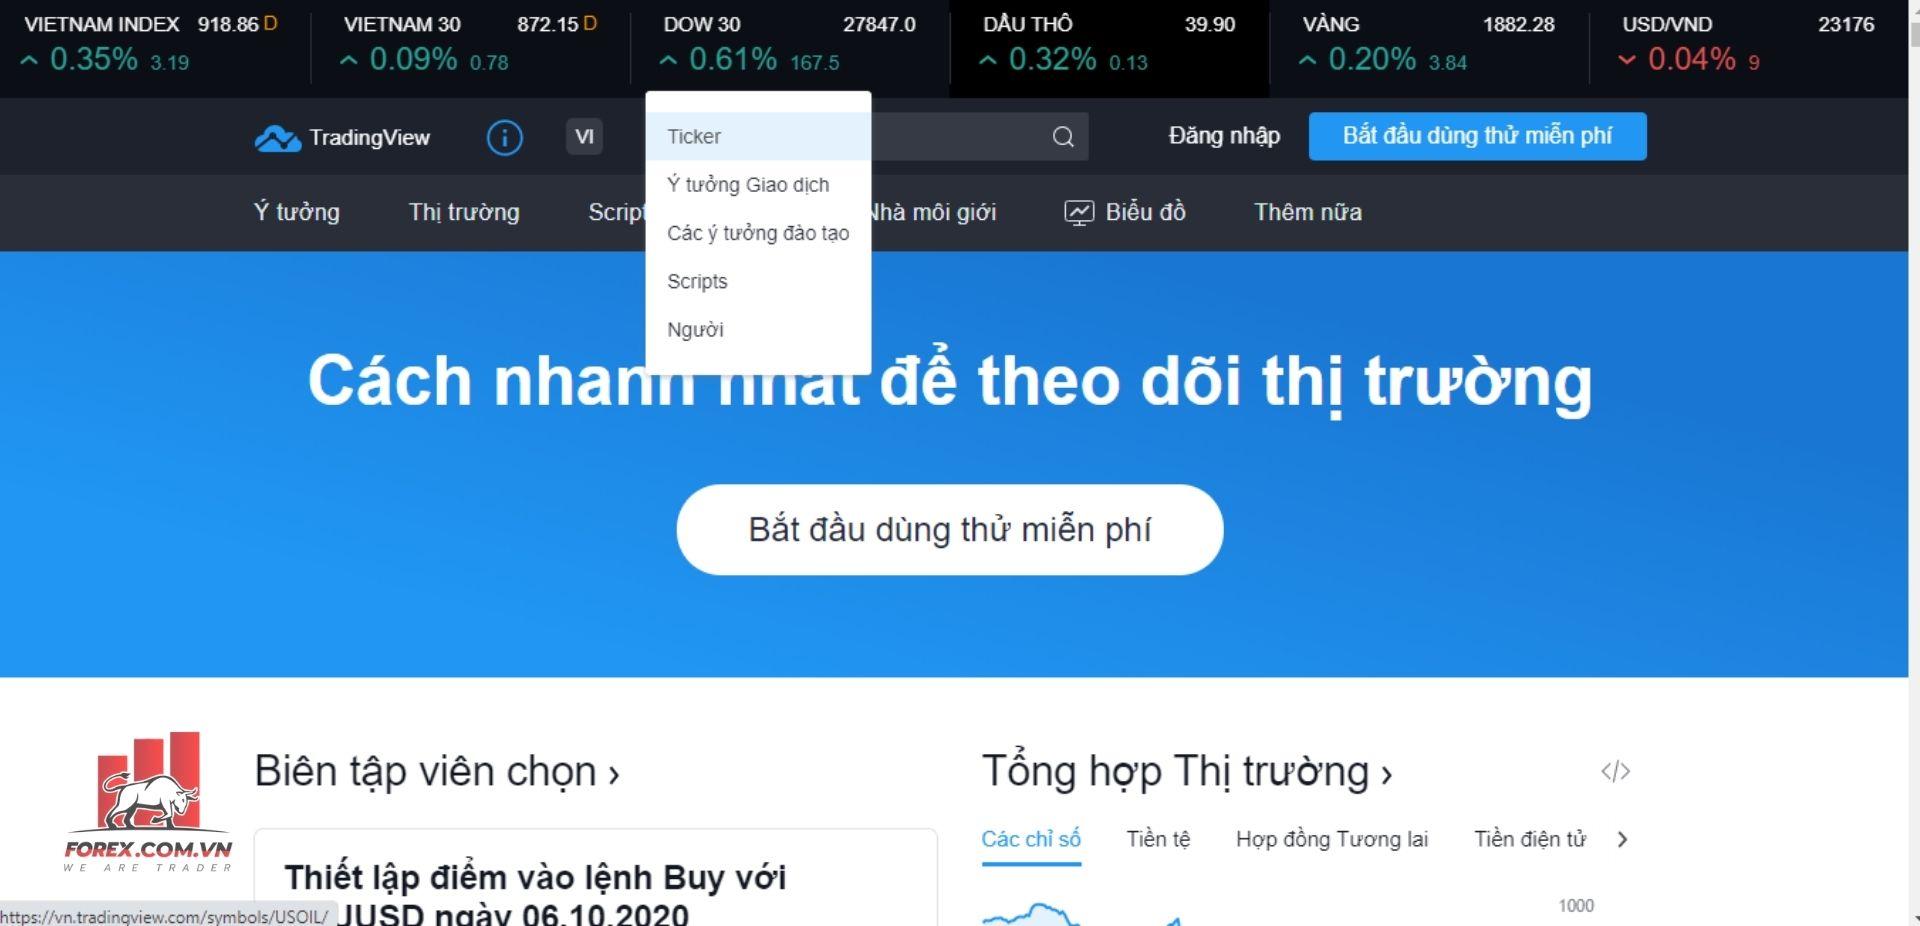 Giới thiệu tổng quan giao diện TradingView 1